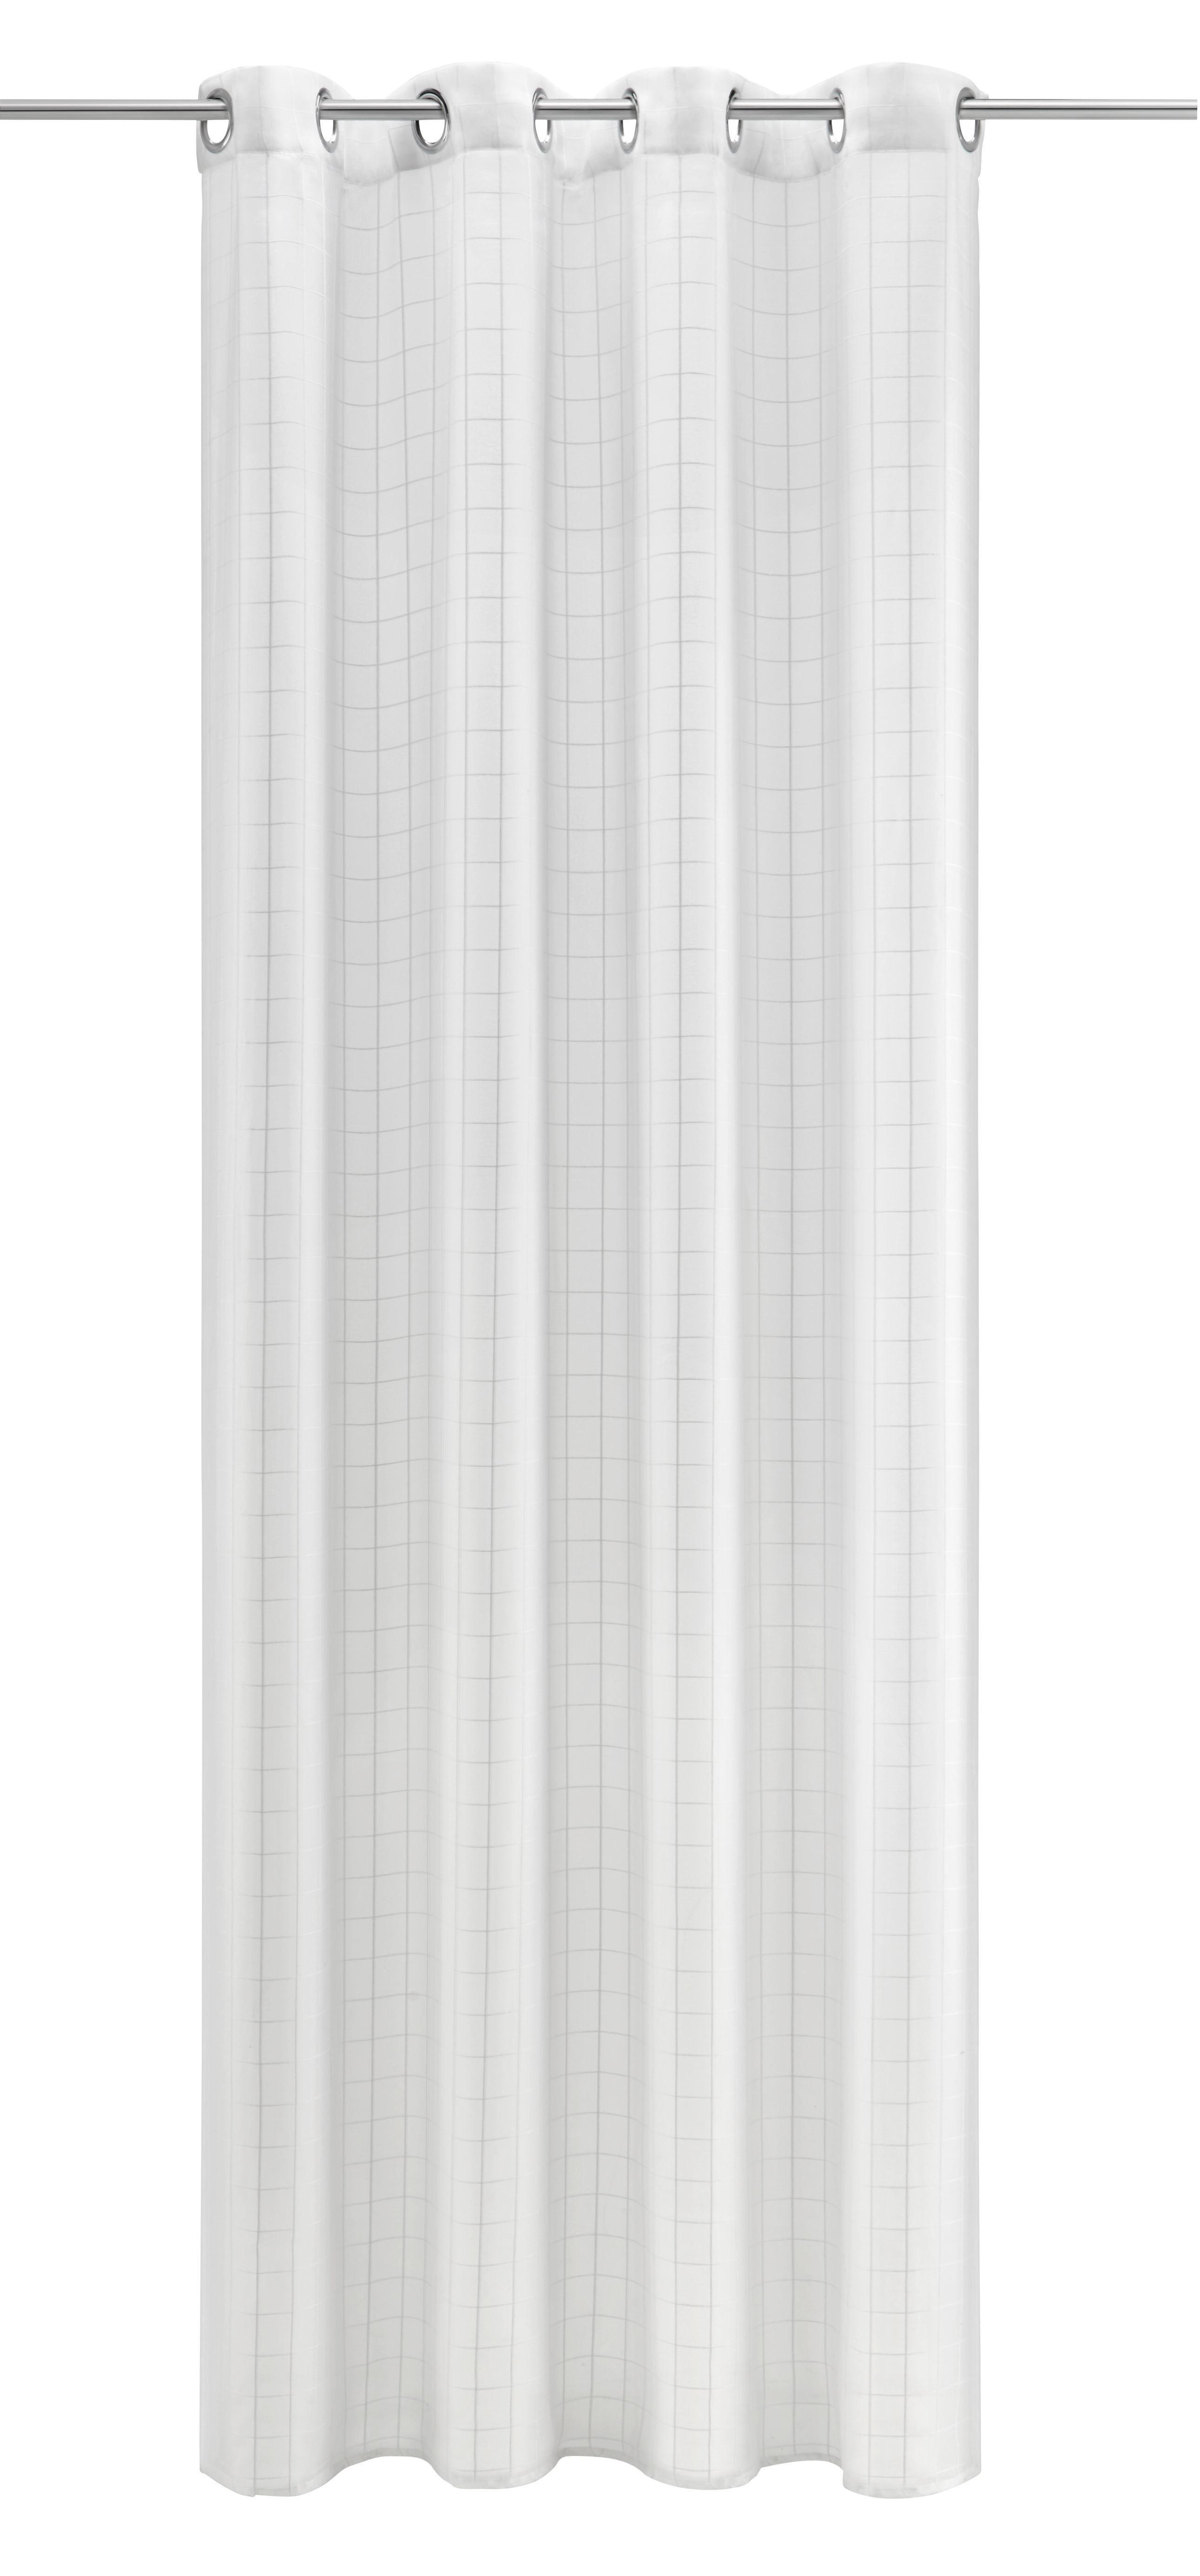 Gardinenschal Eileen 140x245cm - Weiß, MODERN, Textil (140/245cm) - MÖMAX modern living